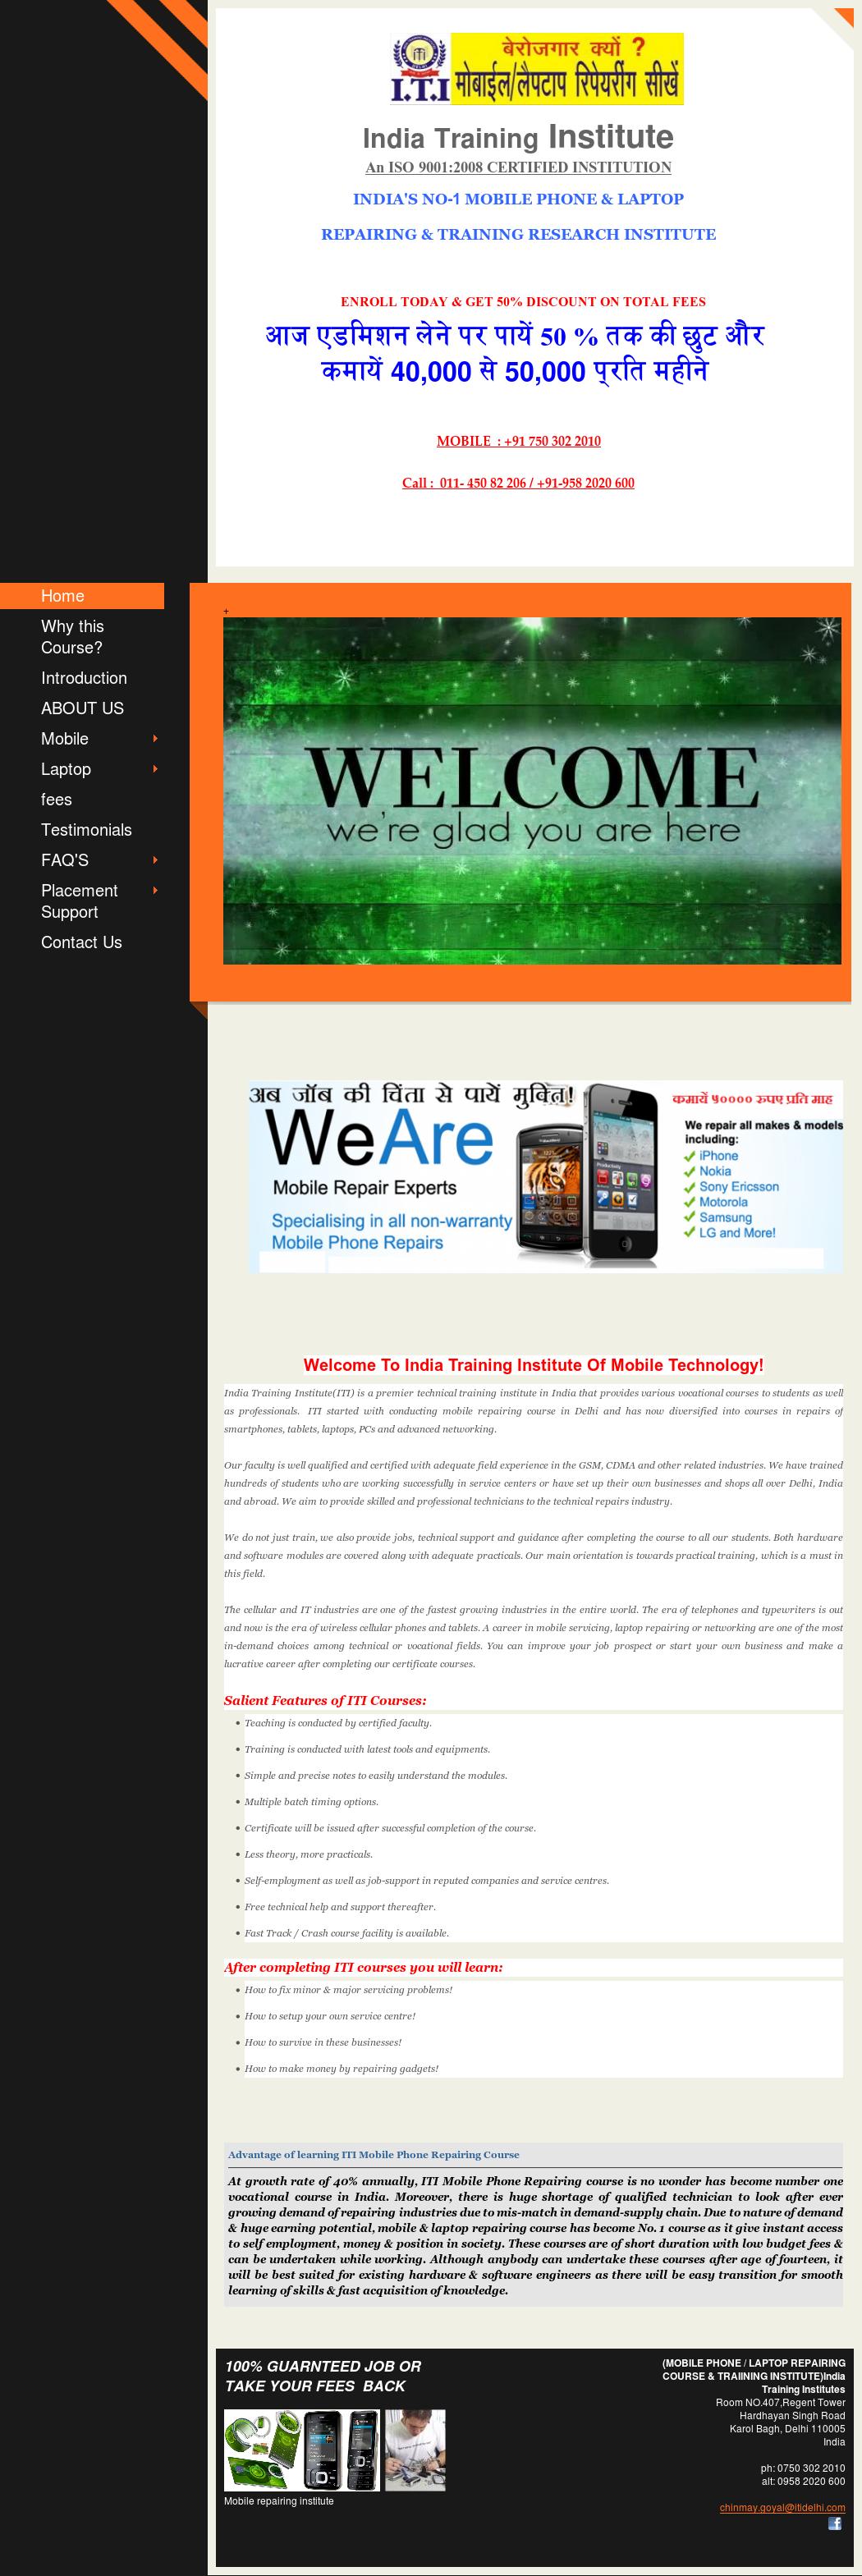 Fix Mobile Phone Course